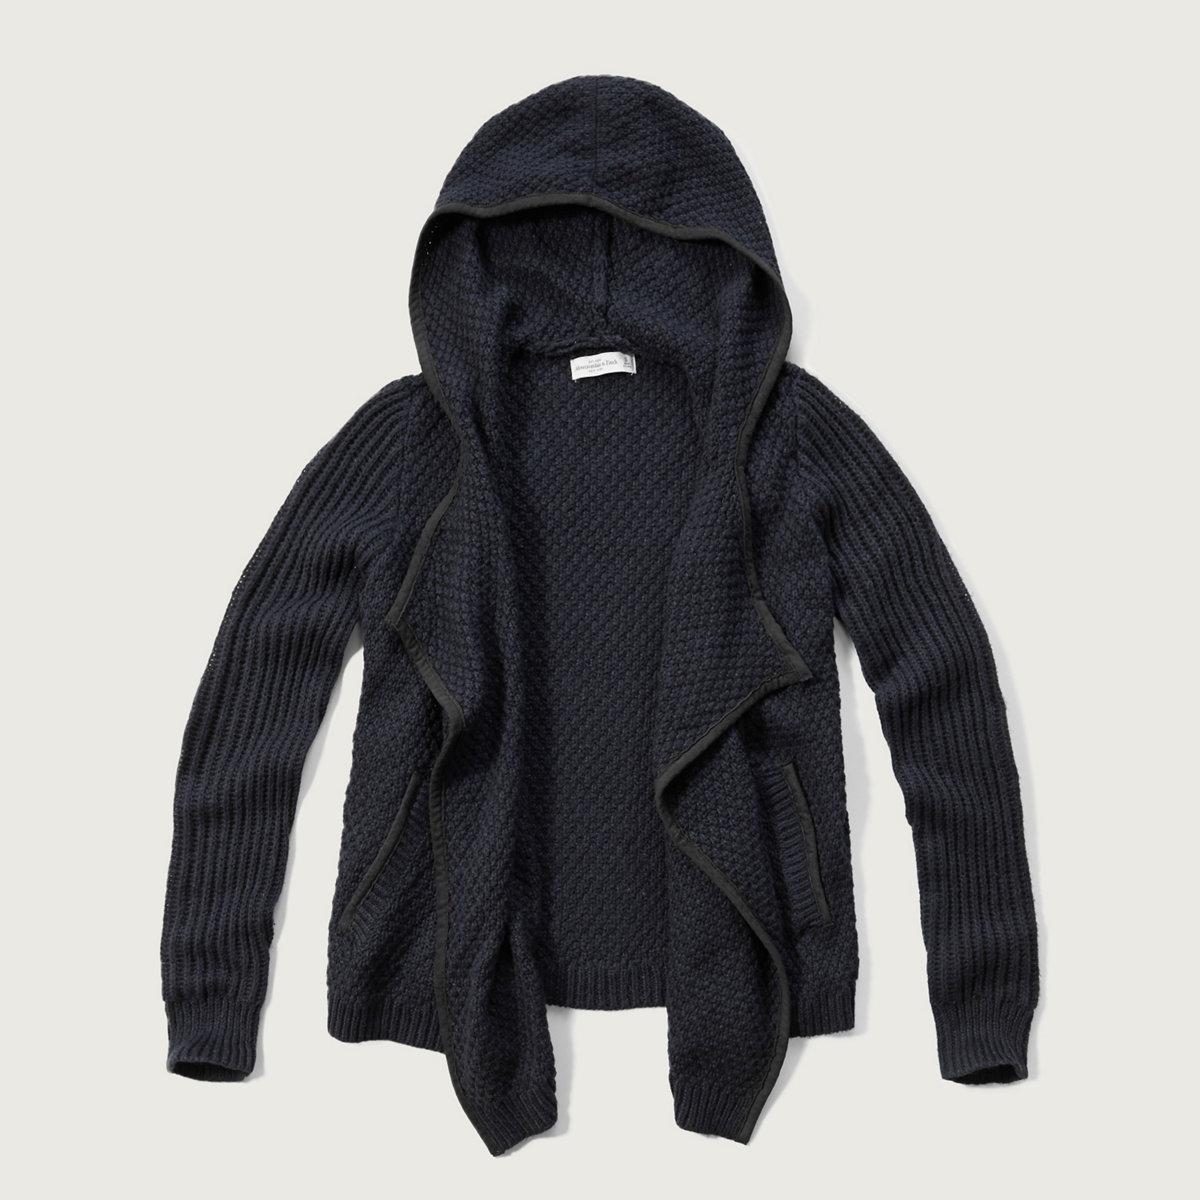 Hooded Open Sweater